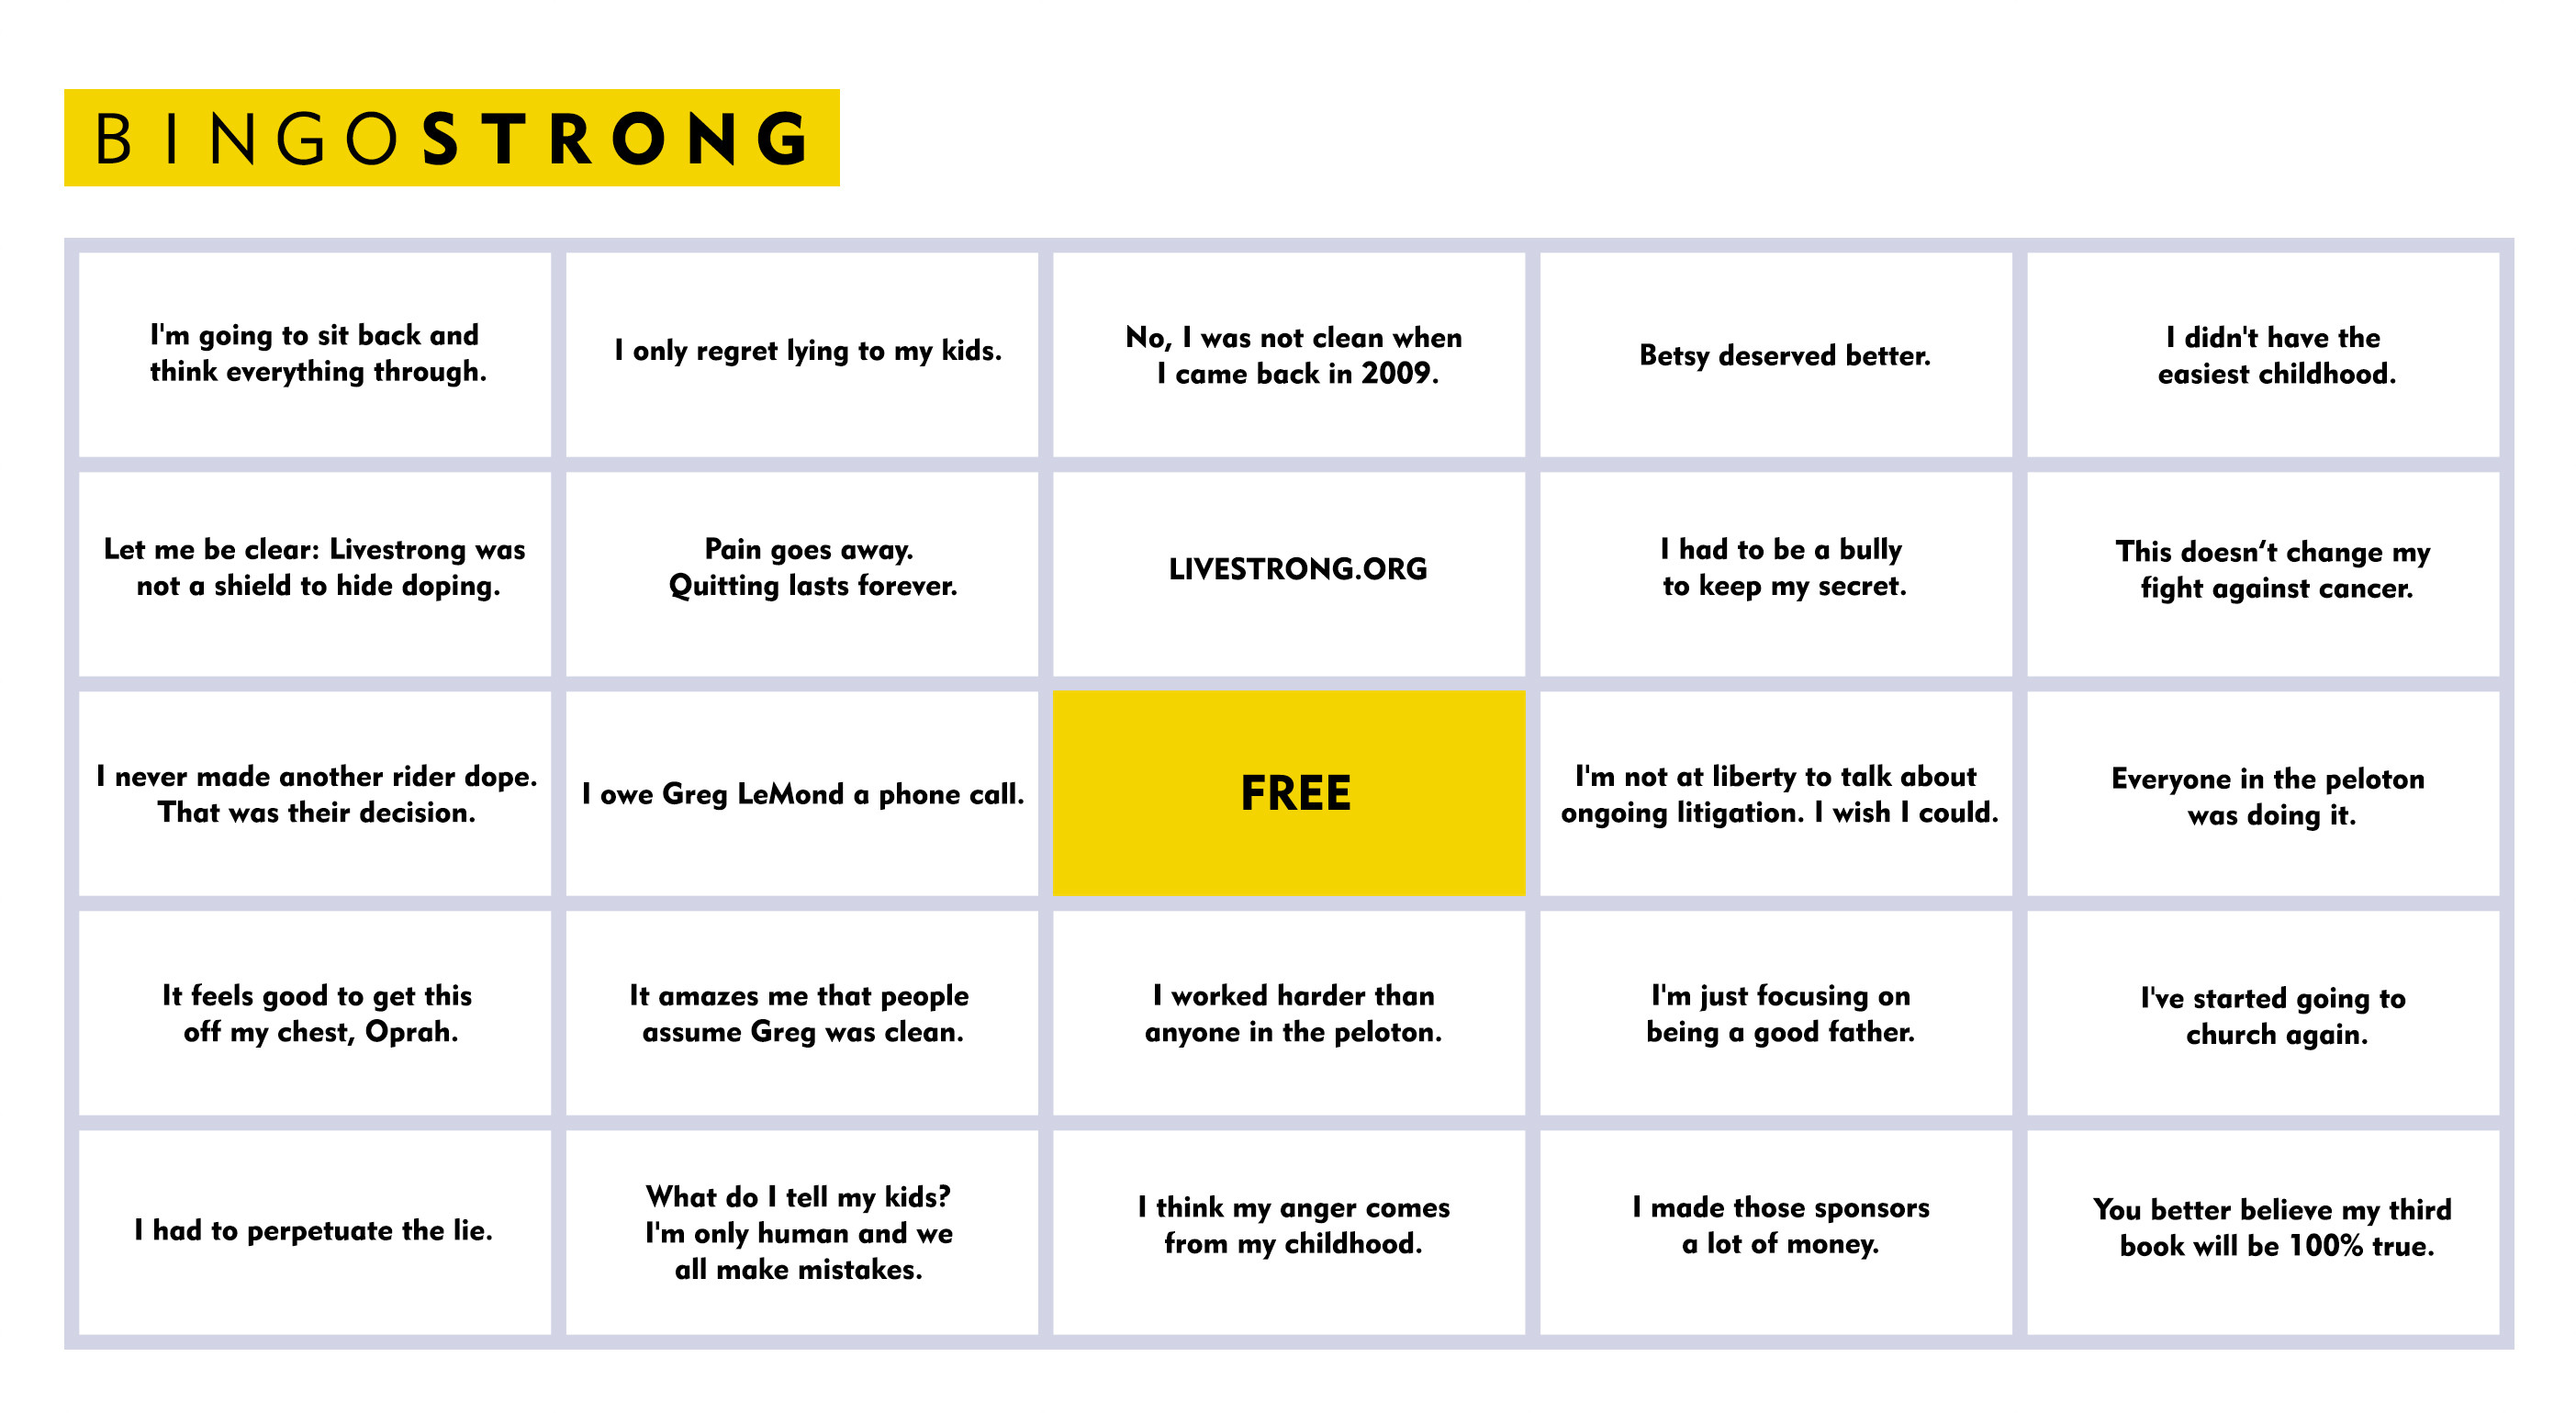 BingoStrong